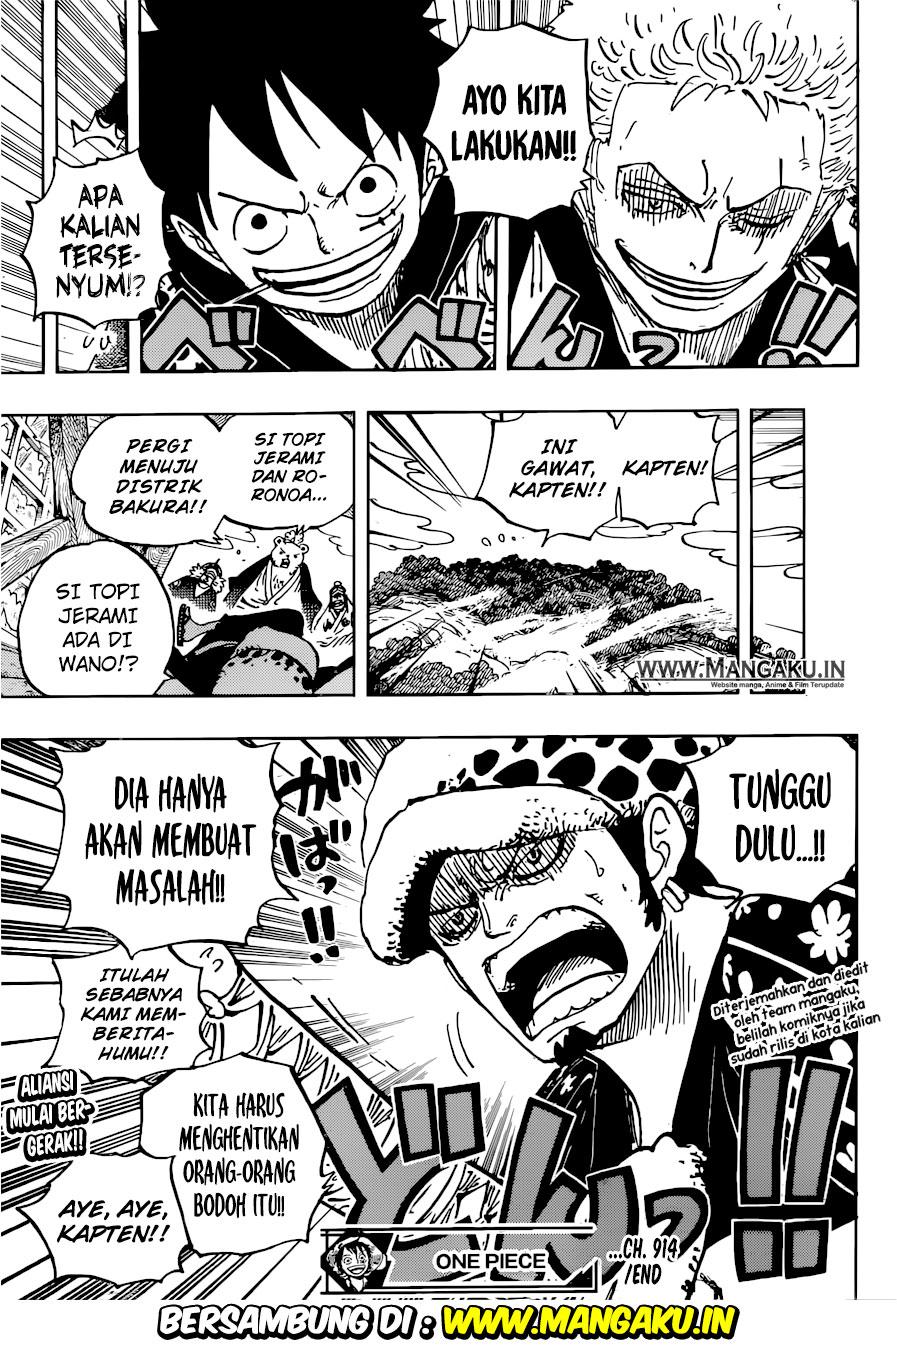 Komik Manga One Piece Chapter 915 Bahasa Indonesia